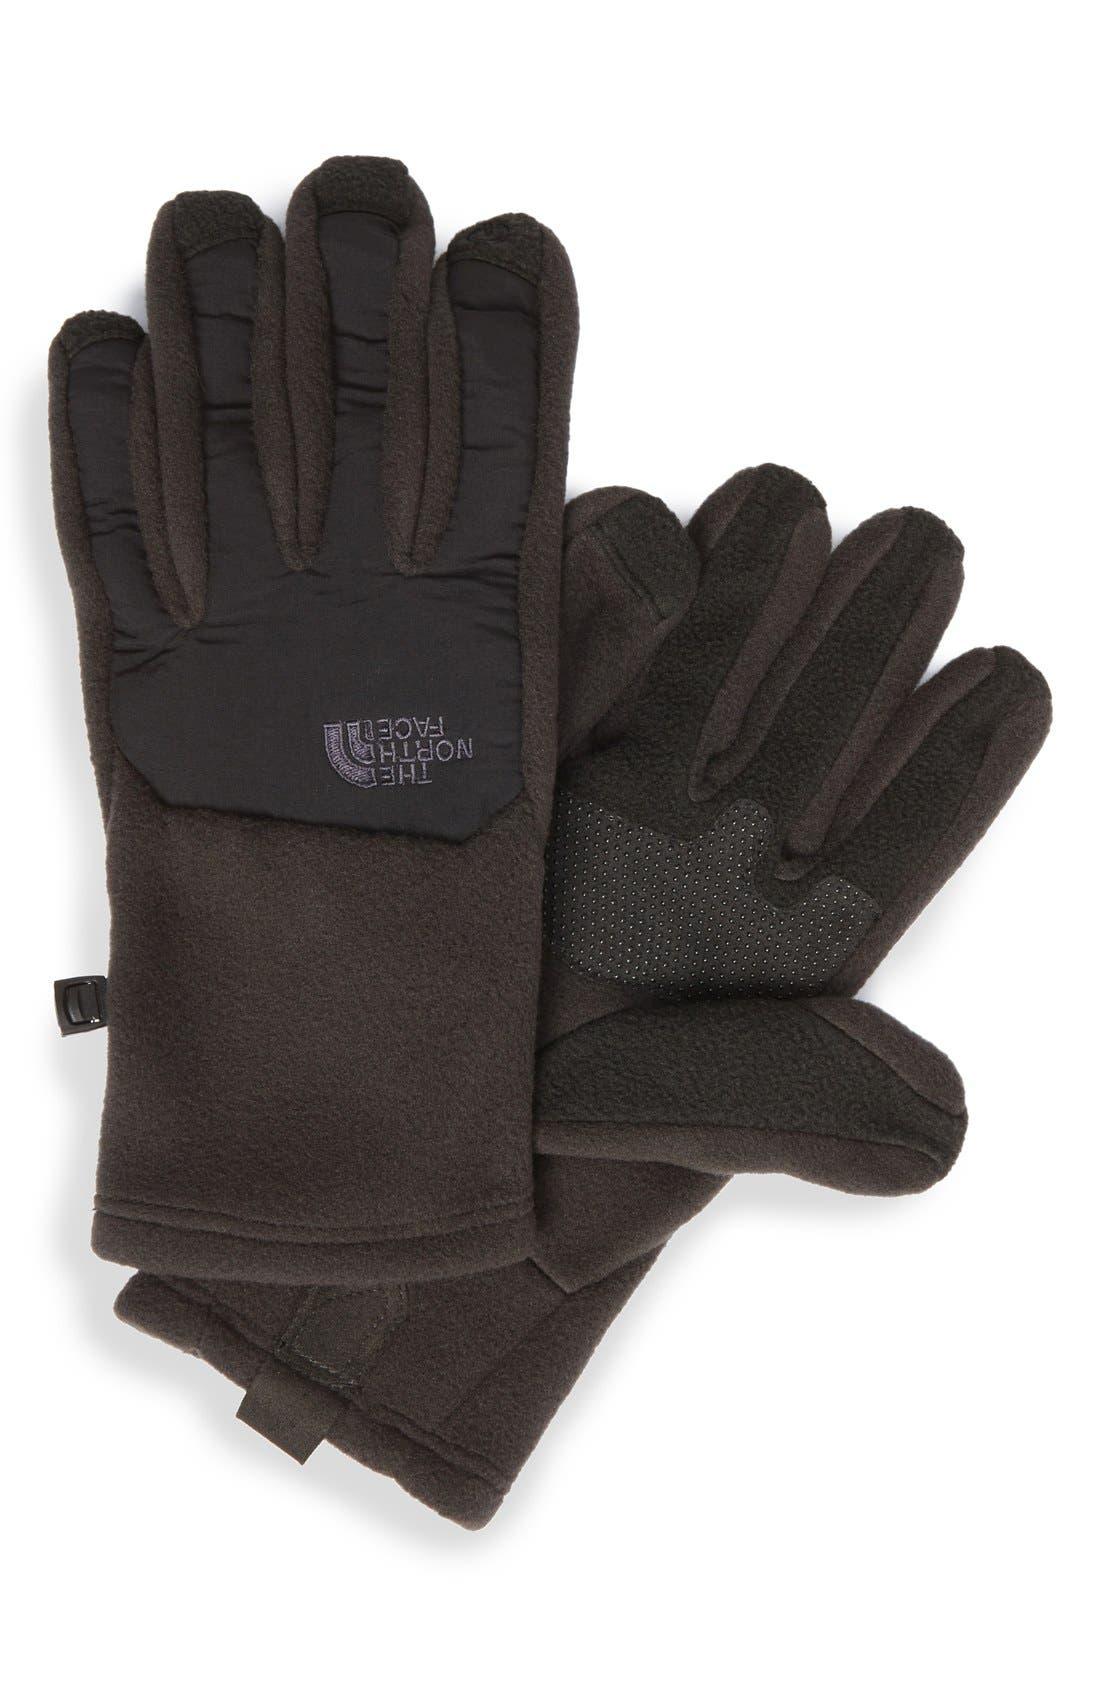 Alternate Image 1 Selected - The North Face 'Denali' E-Tip Gloves